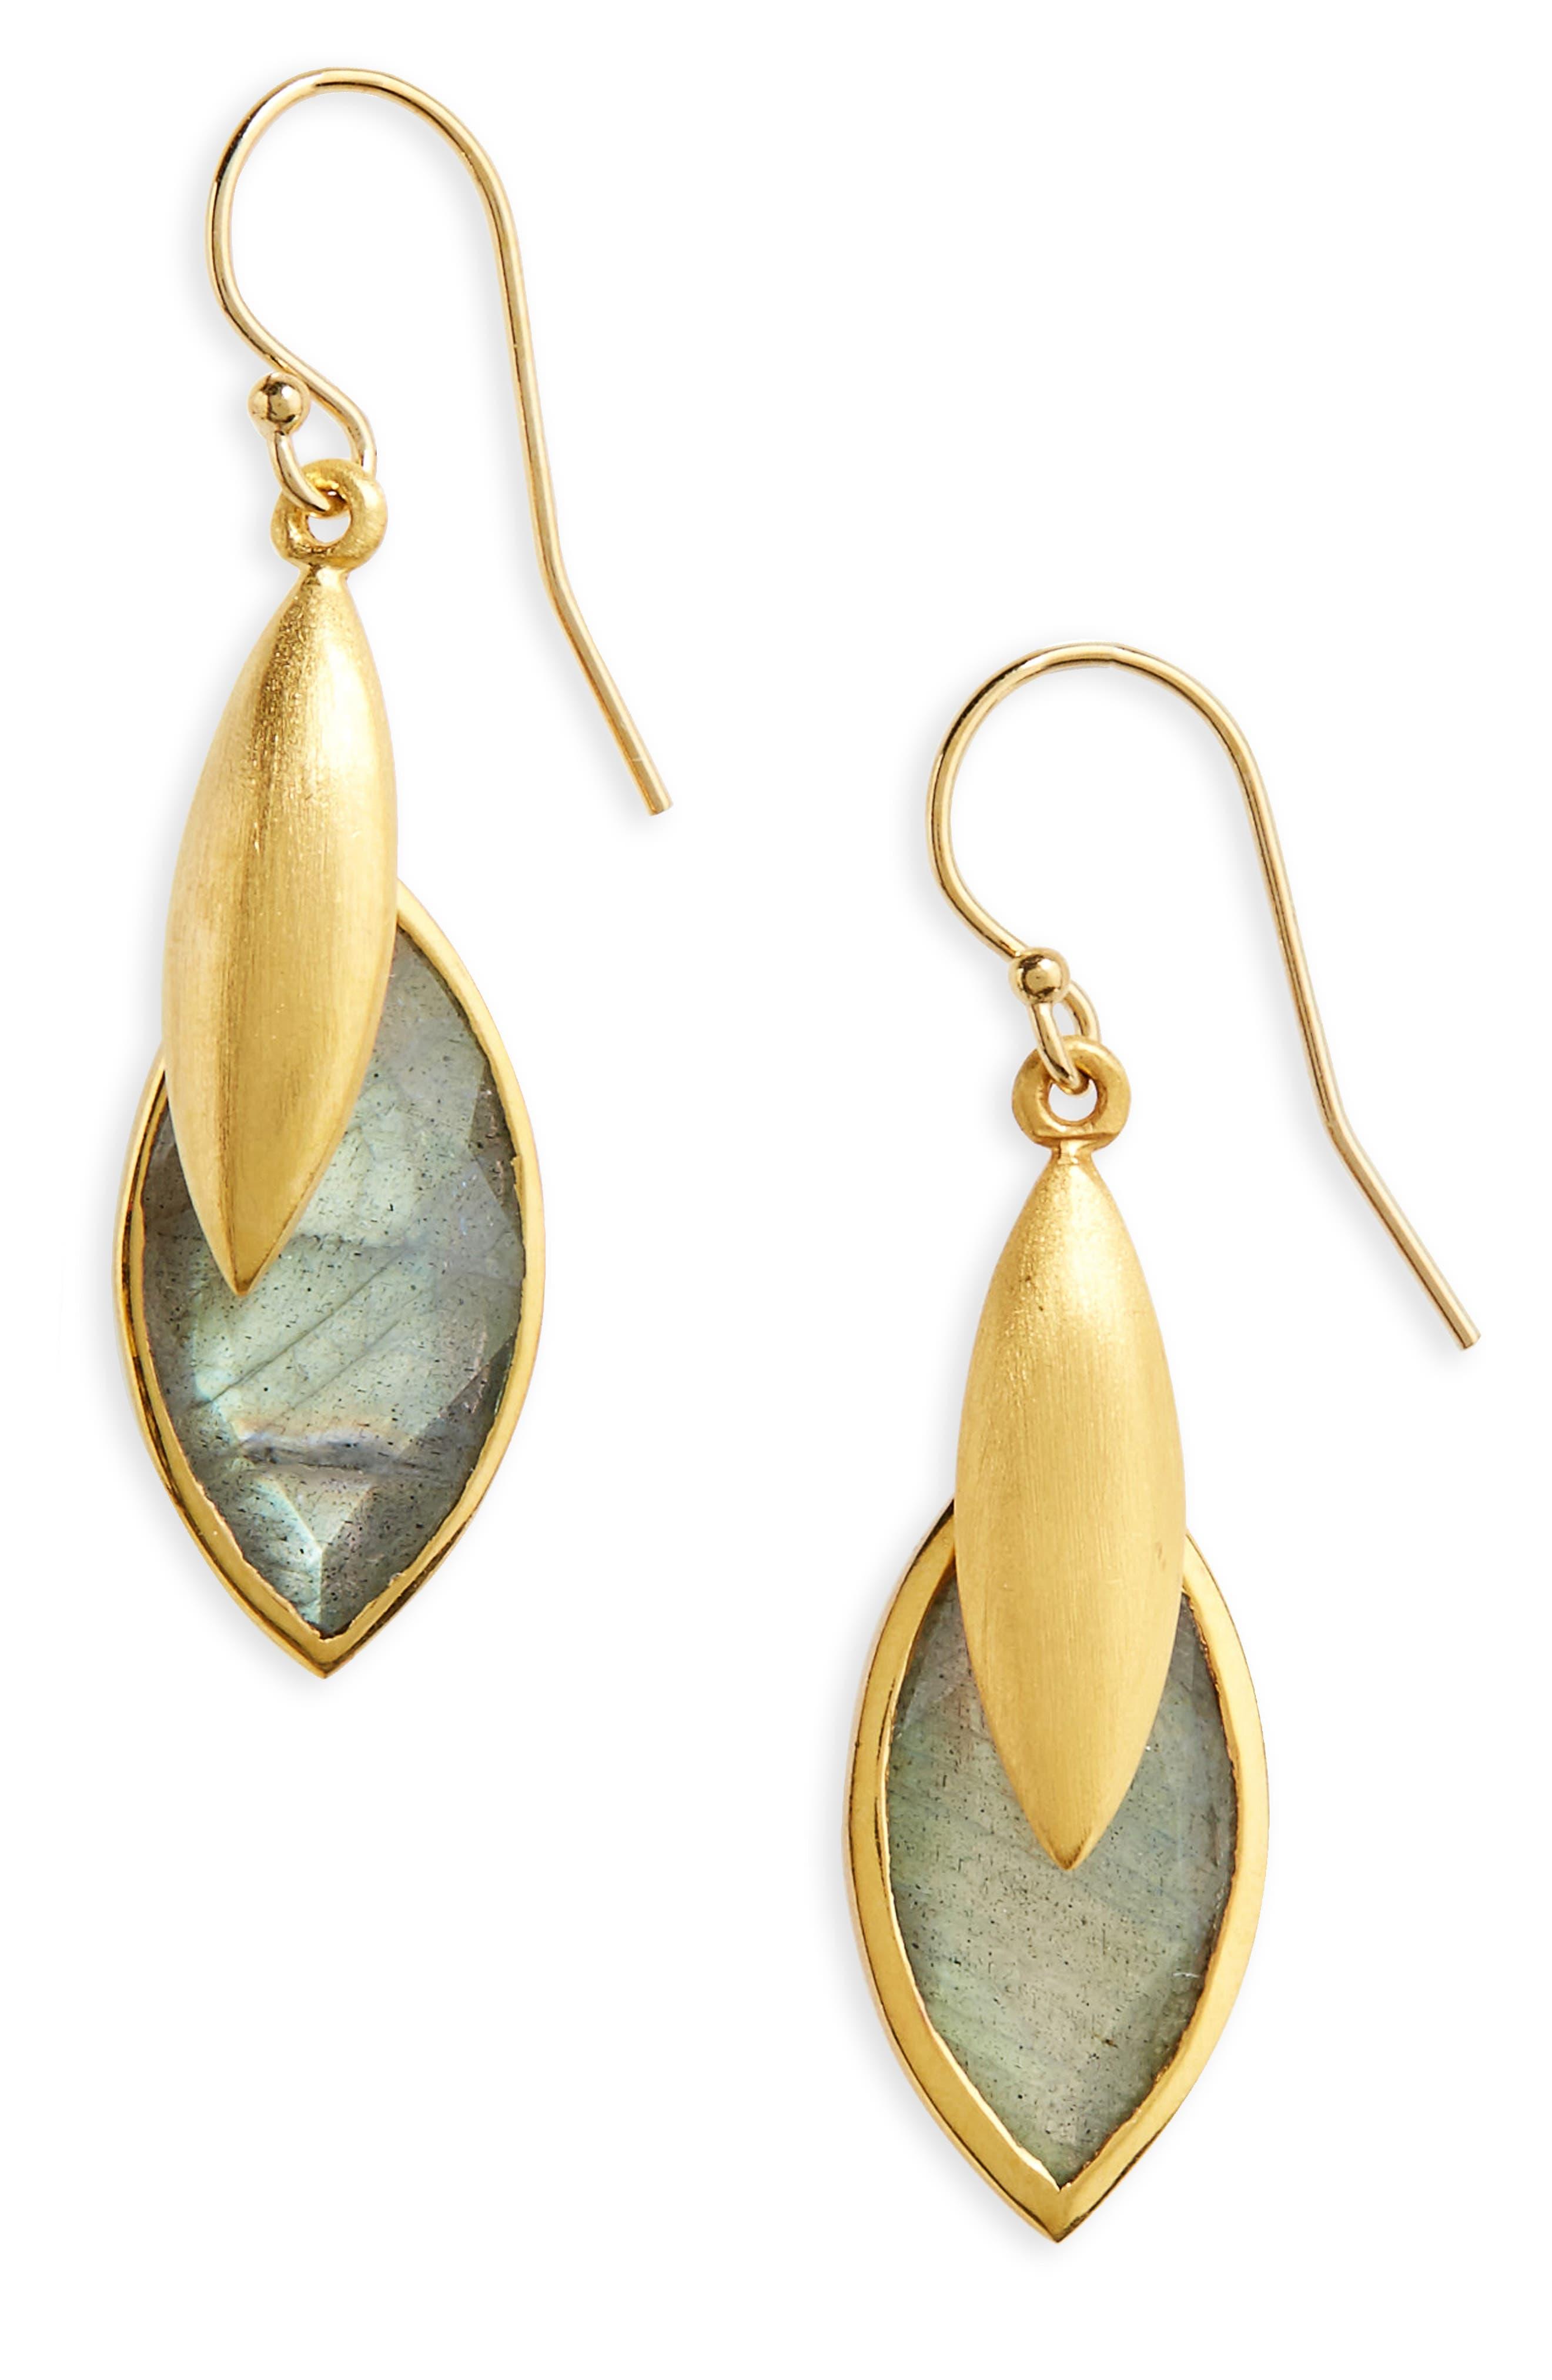 Dean Davidson Lotus Earrings